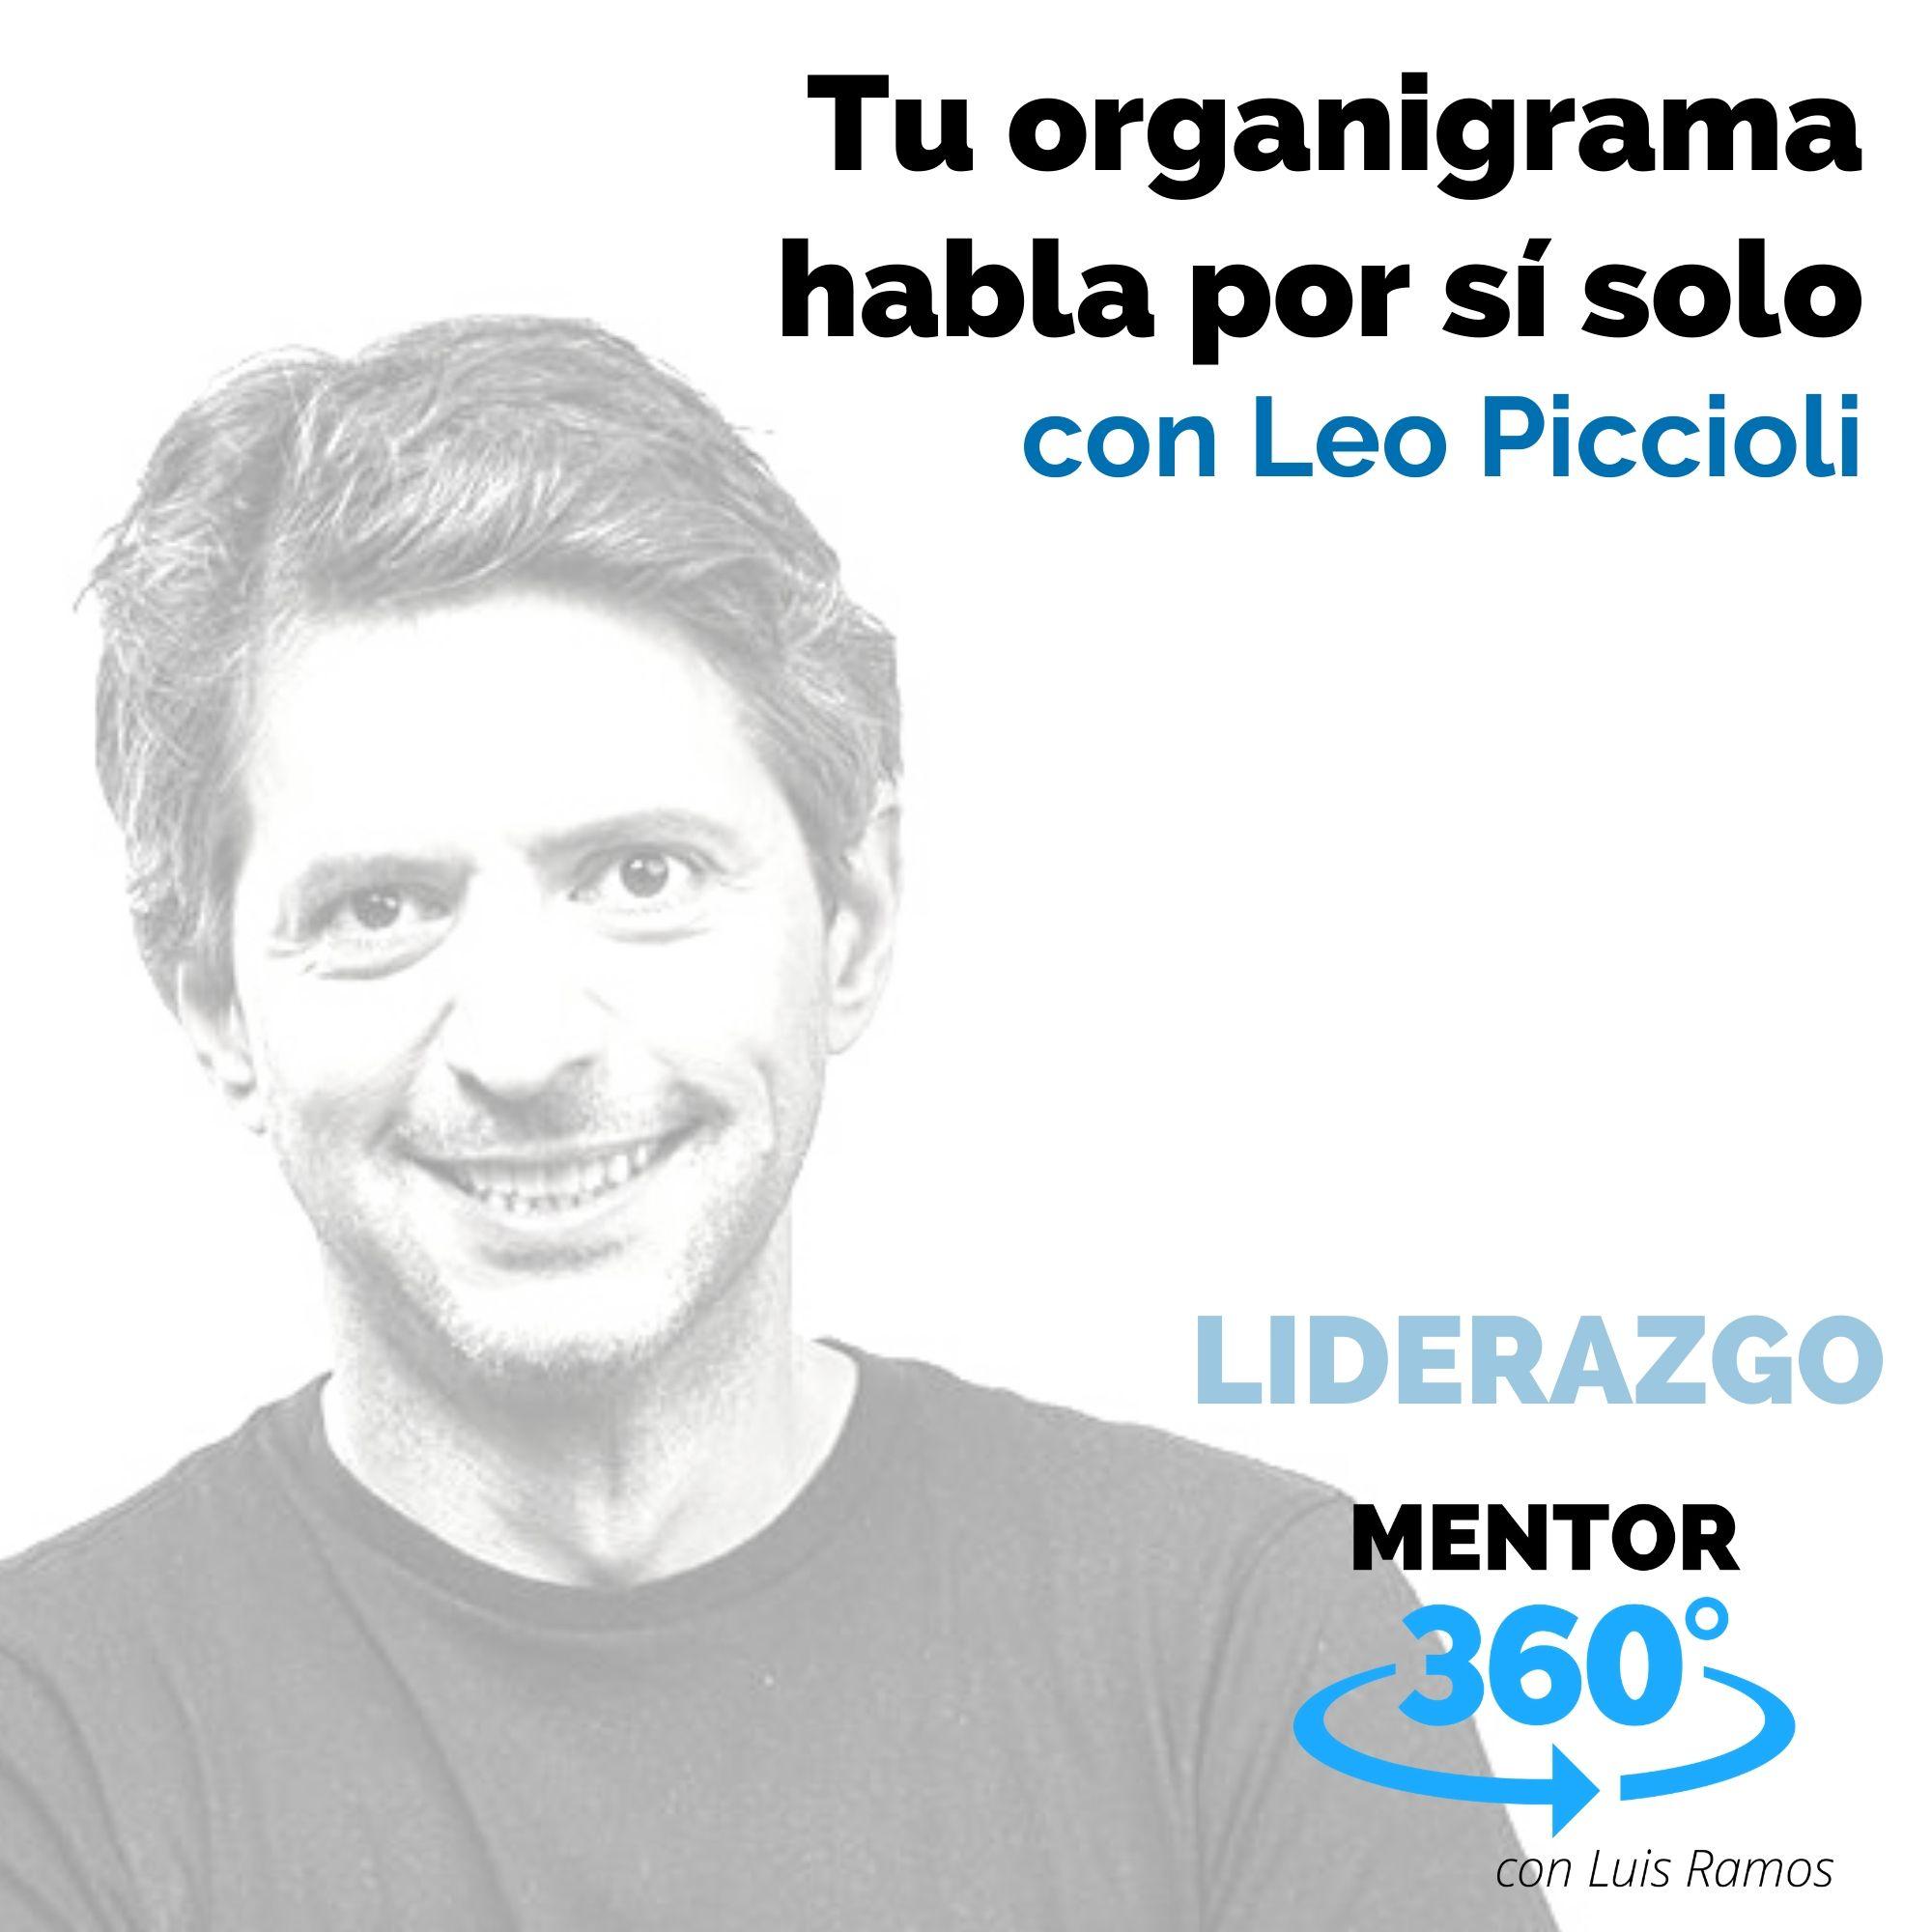 Tu organigrama habla por sí solo, con Leo Piccioli - LIDERAZGO